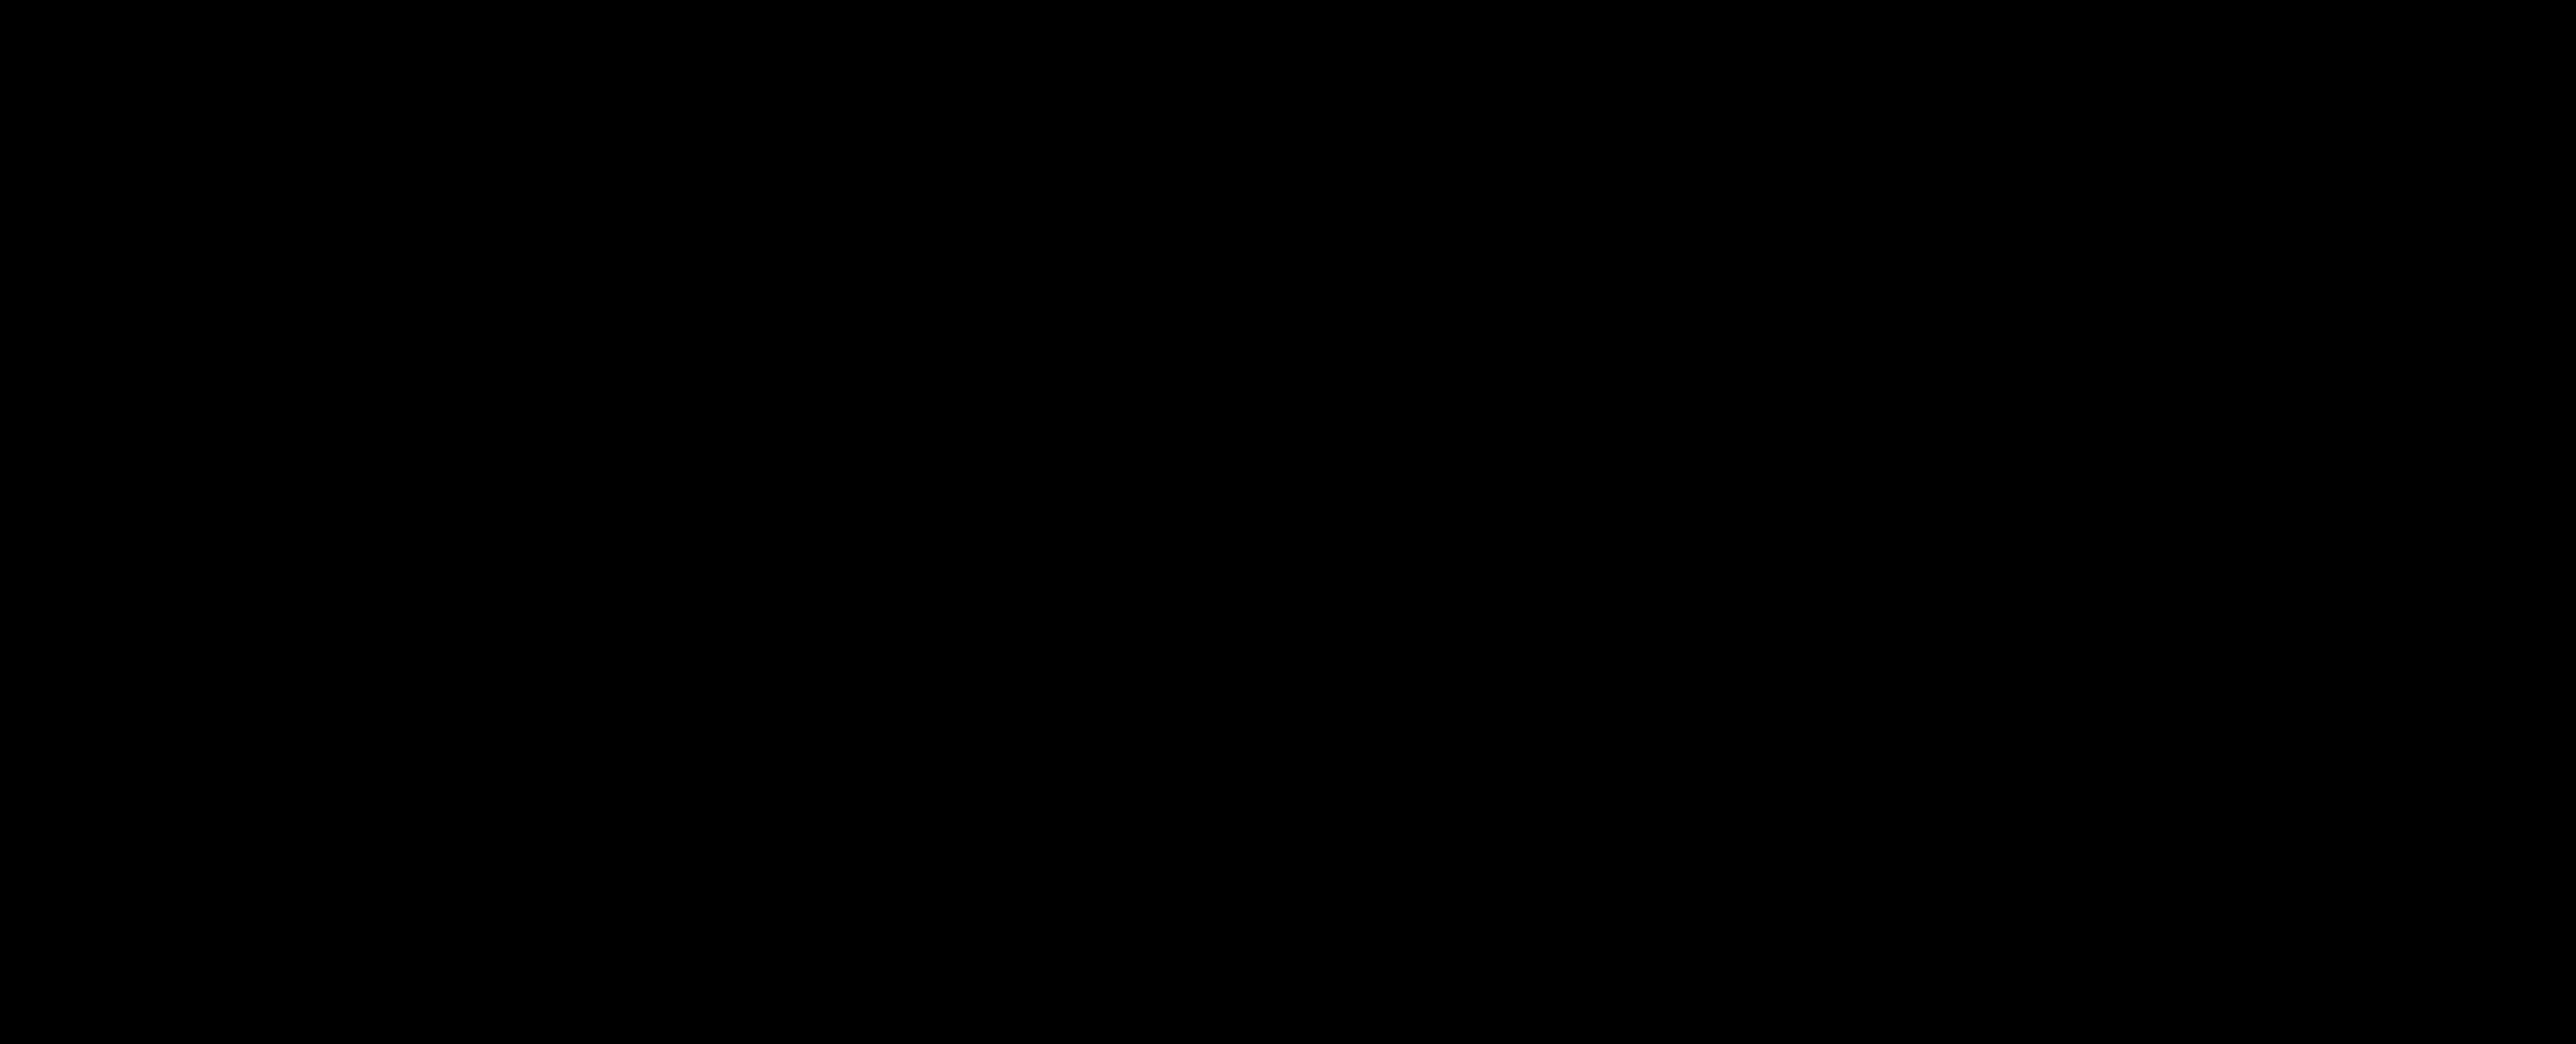 SamuraiWTF: Penetration Testing Linux distribution!